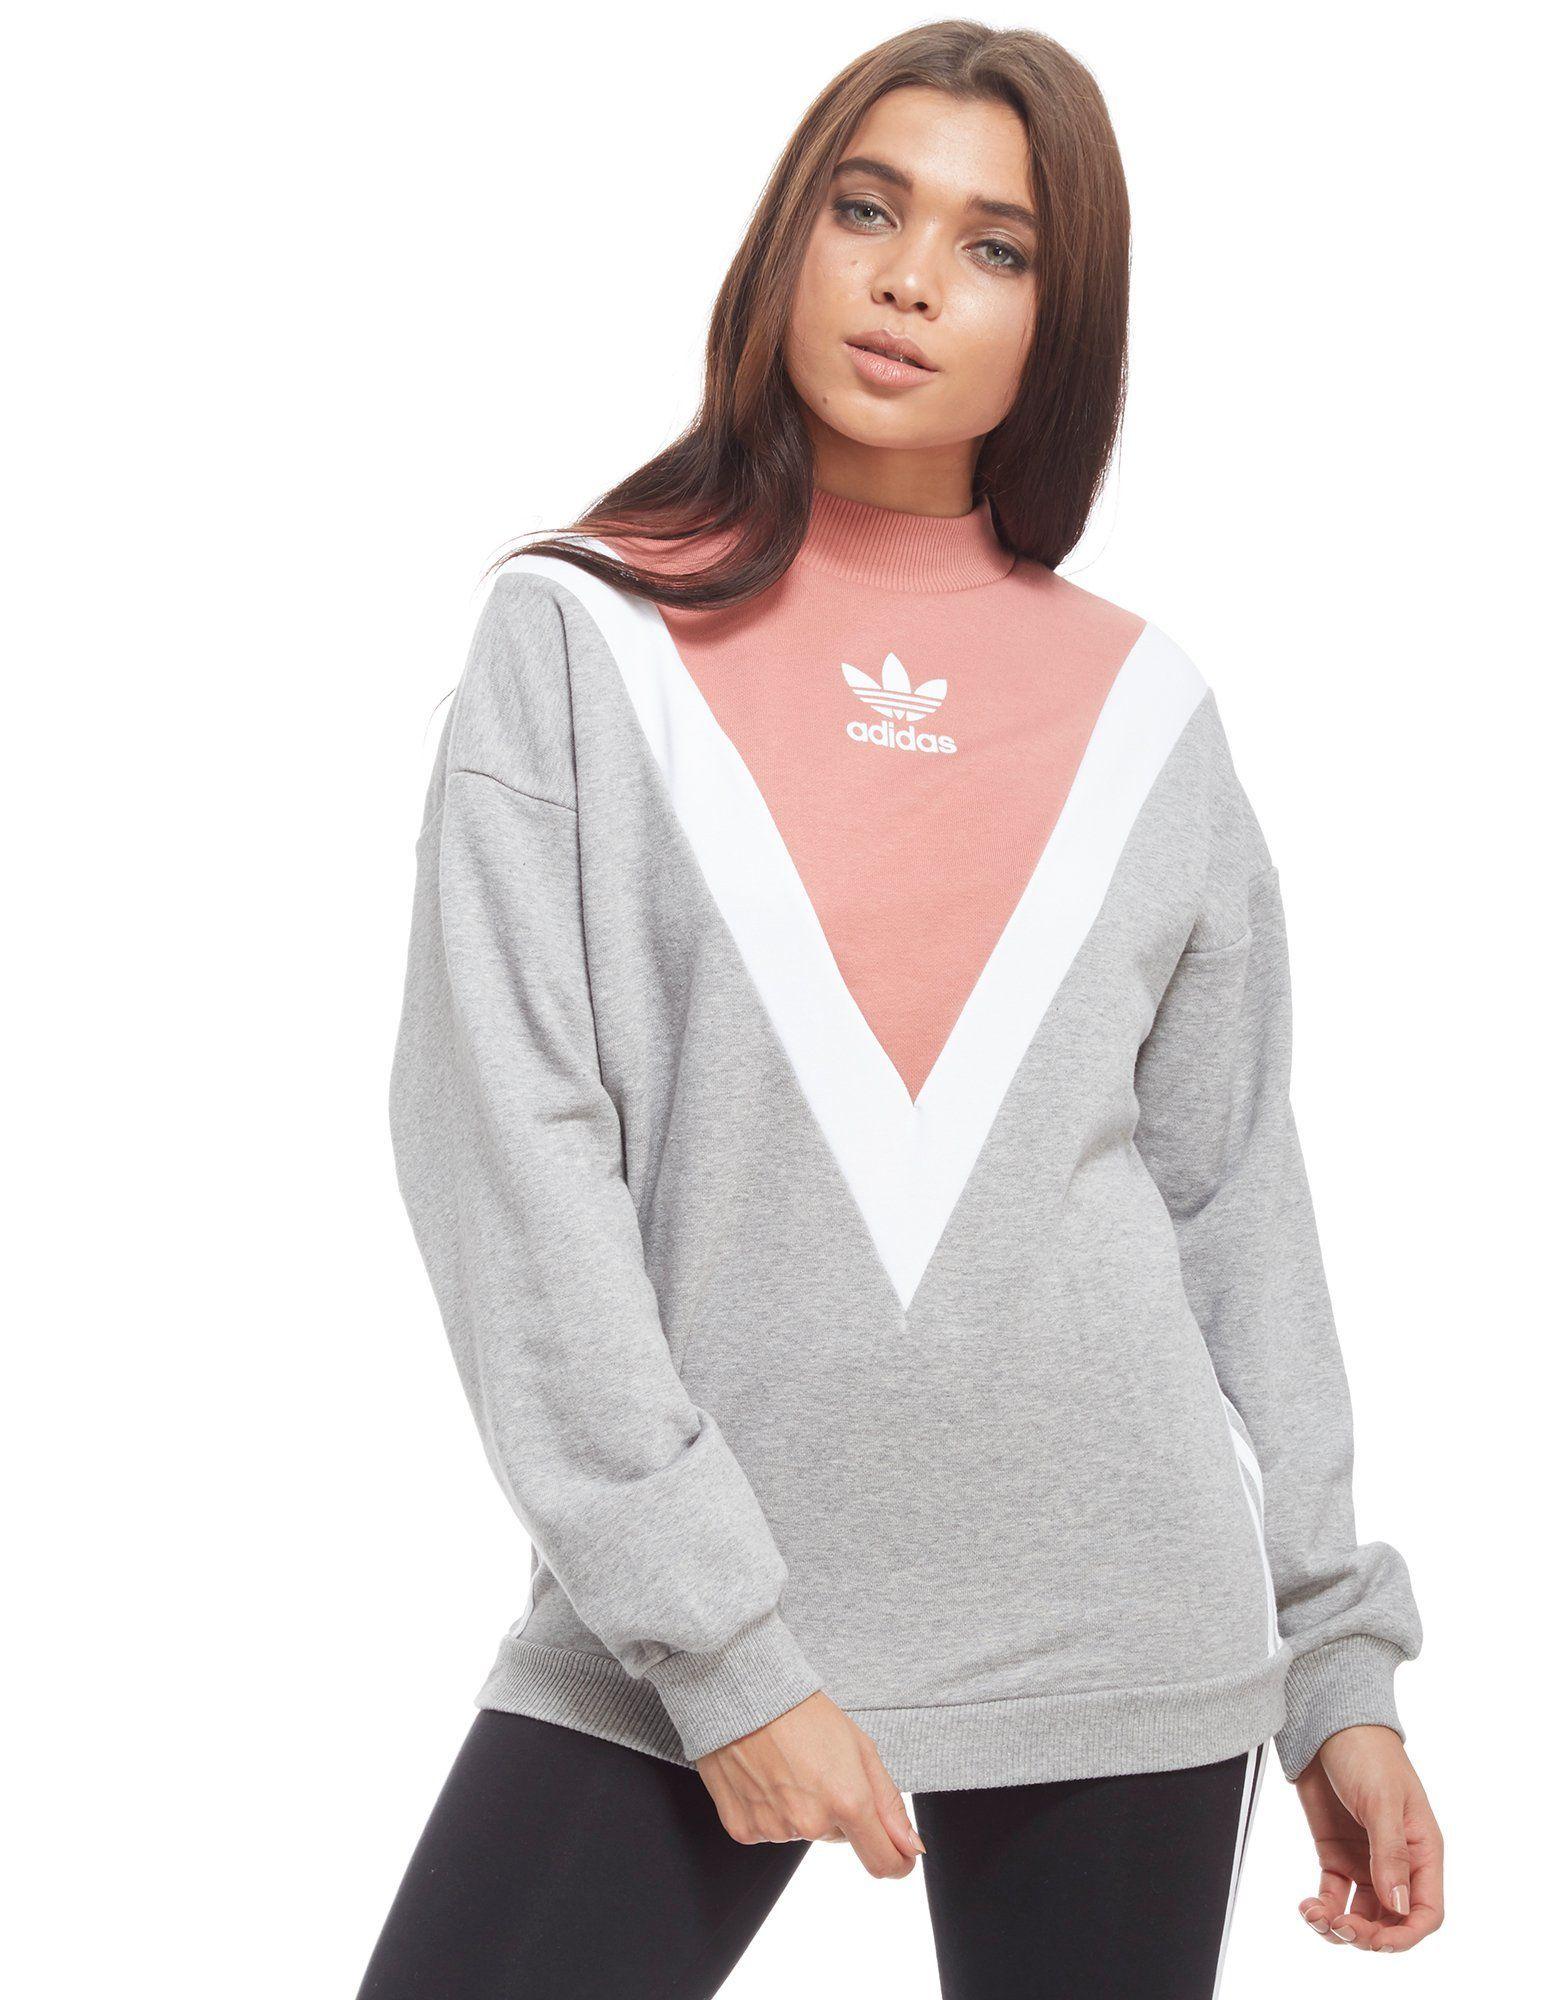 Adidas Originals Gray Chevron Sweatshirt